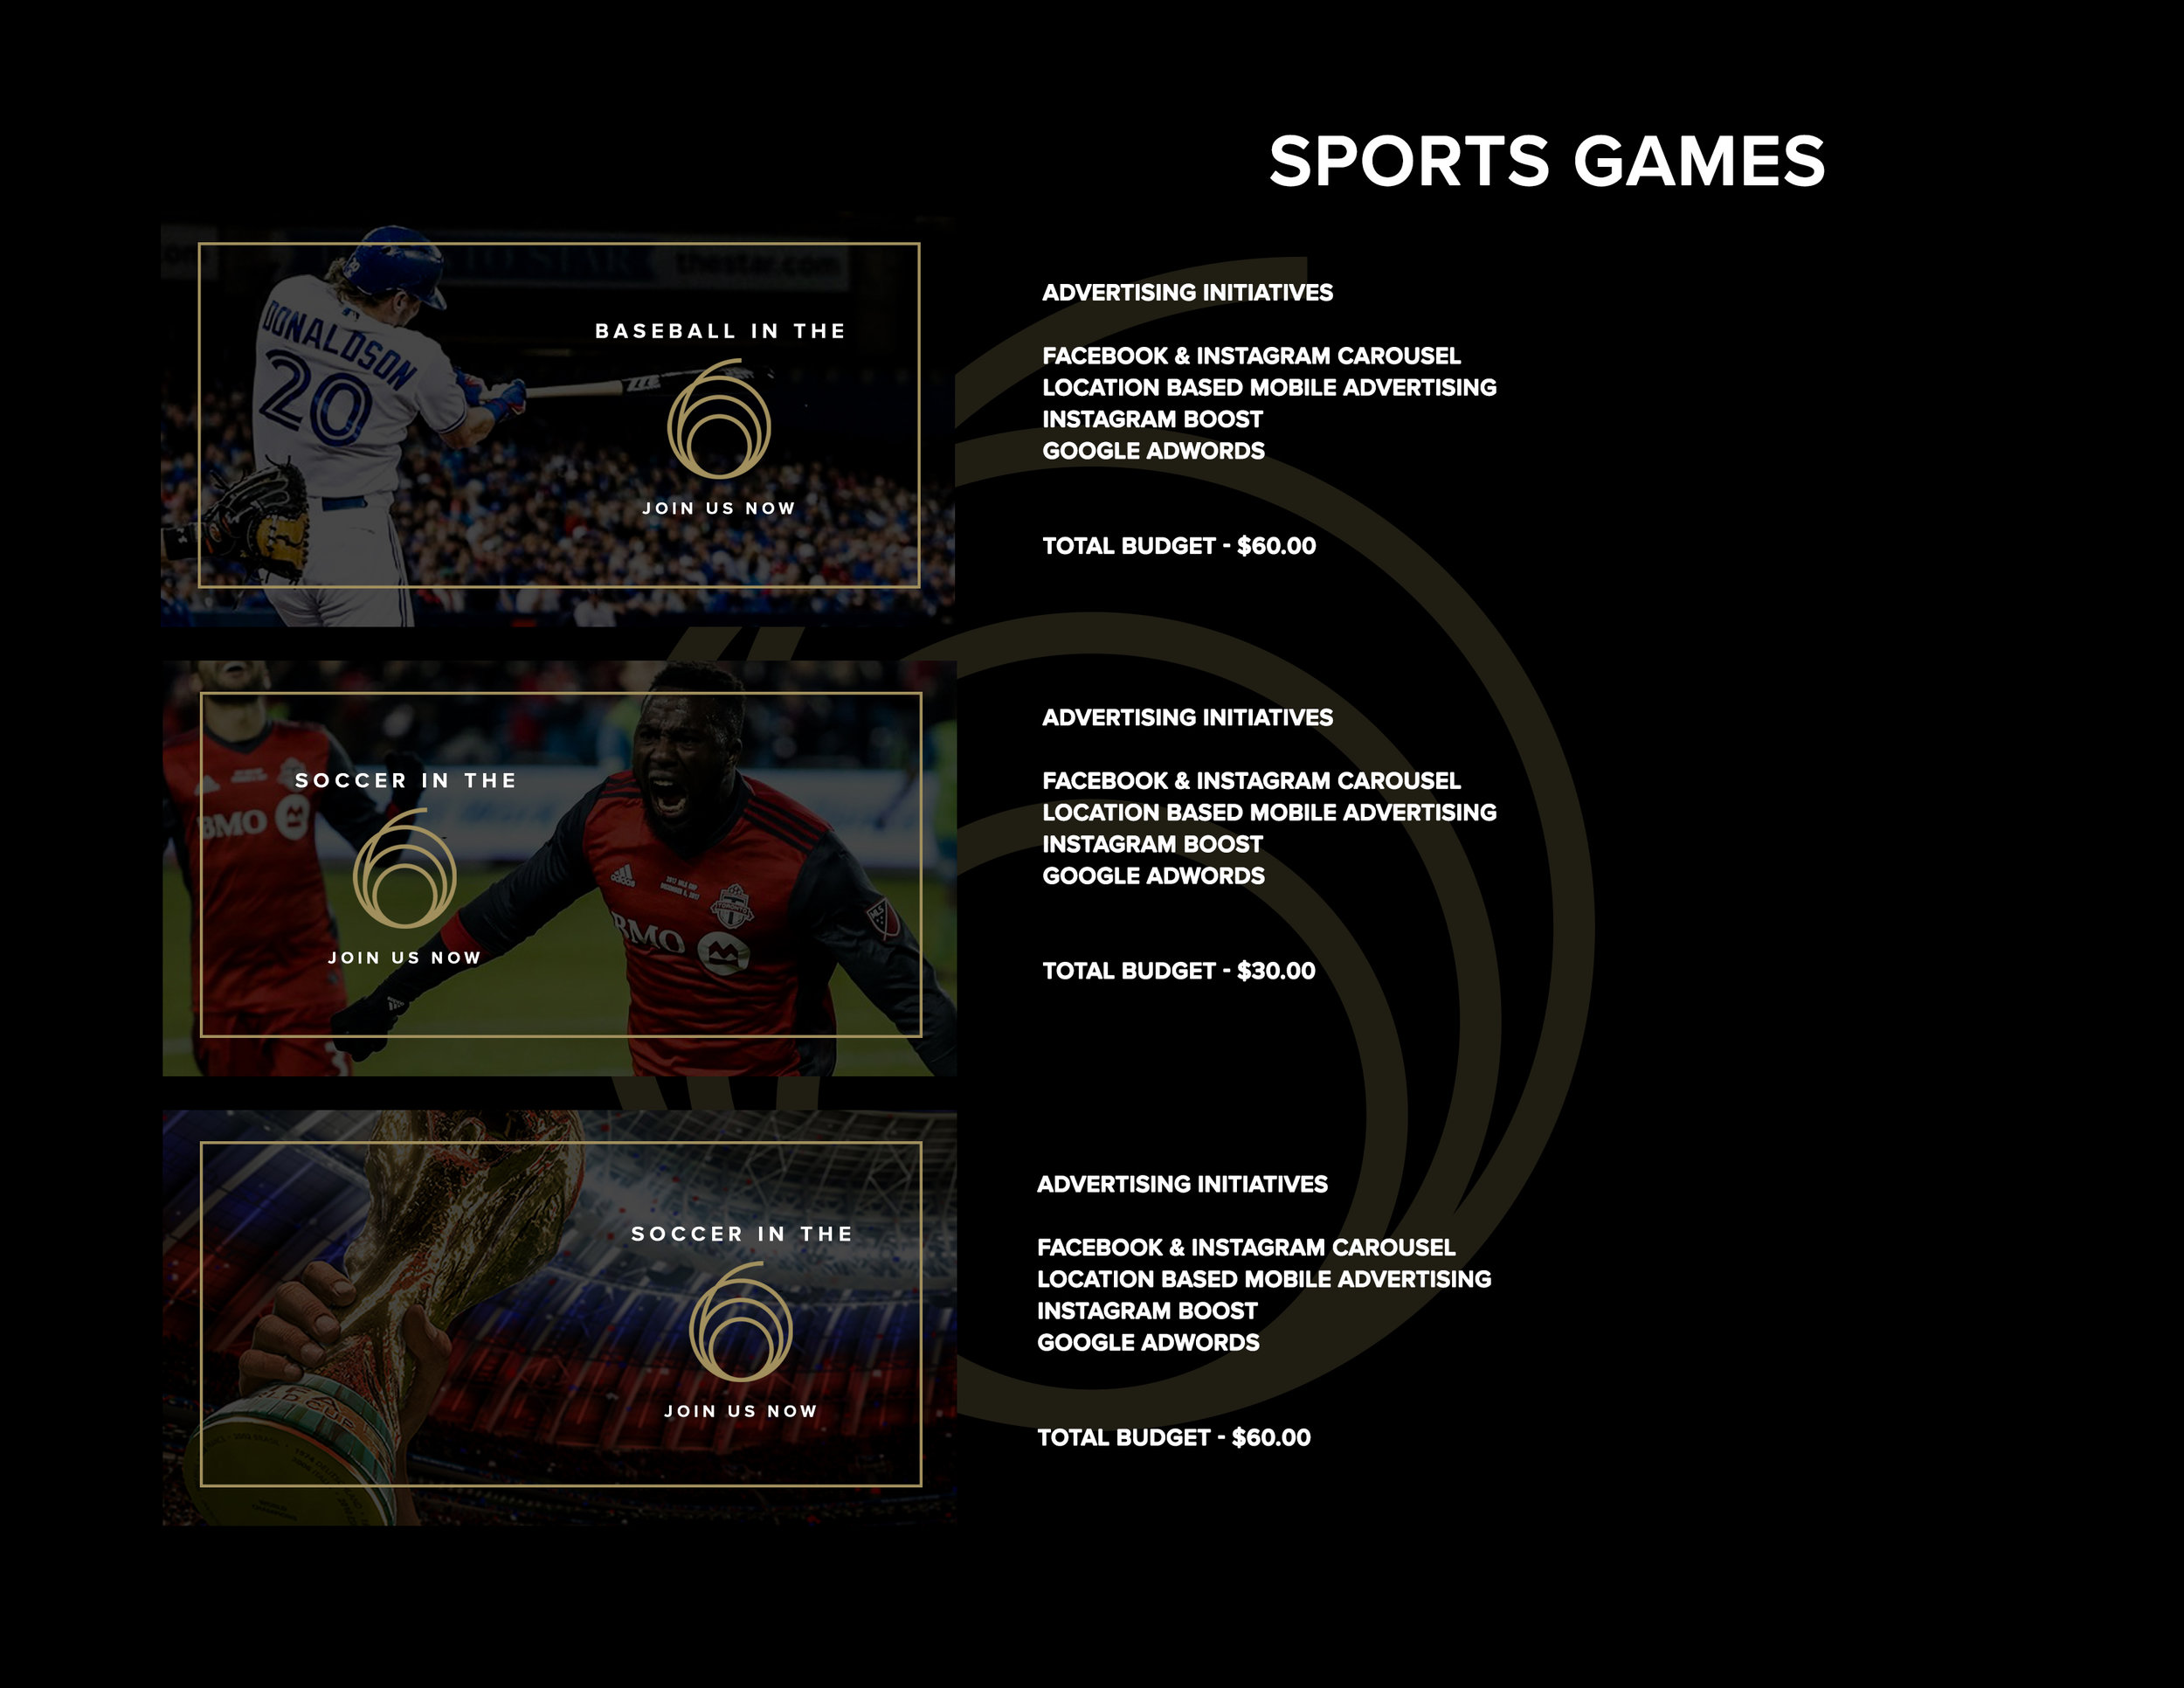 Pixk6ix_SportsGames.jpg